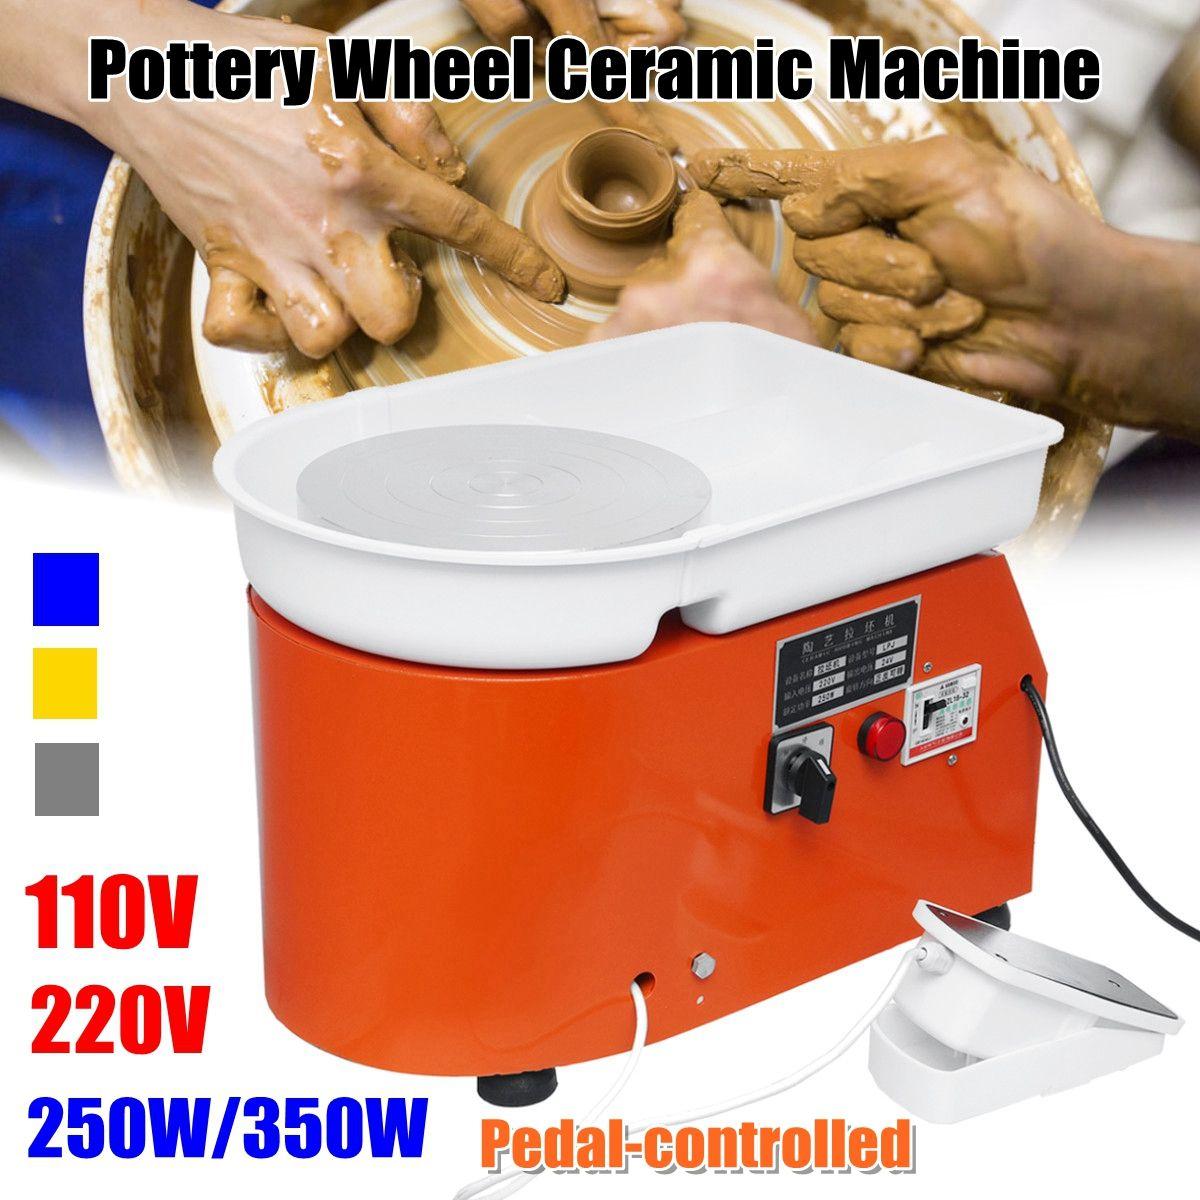 250W/350W Electric Tours Wheel Pottery Machine Ceramic Clay Potter Art For Ceramic Work Ceramics 110V/220V